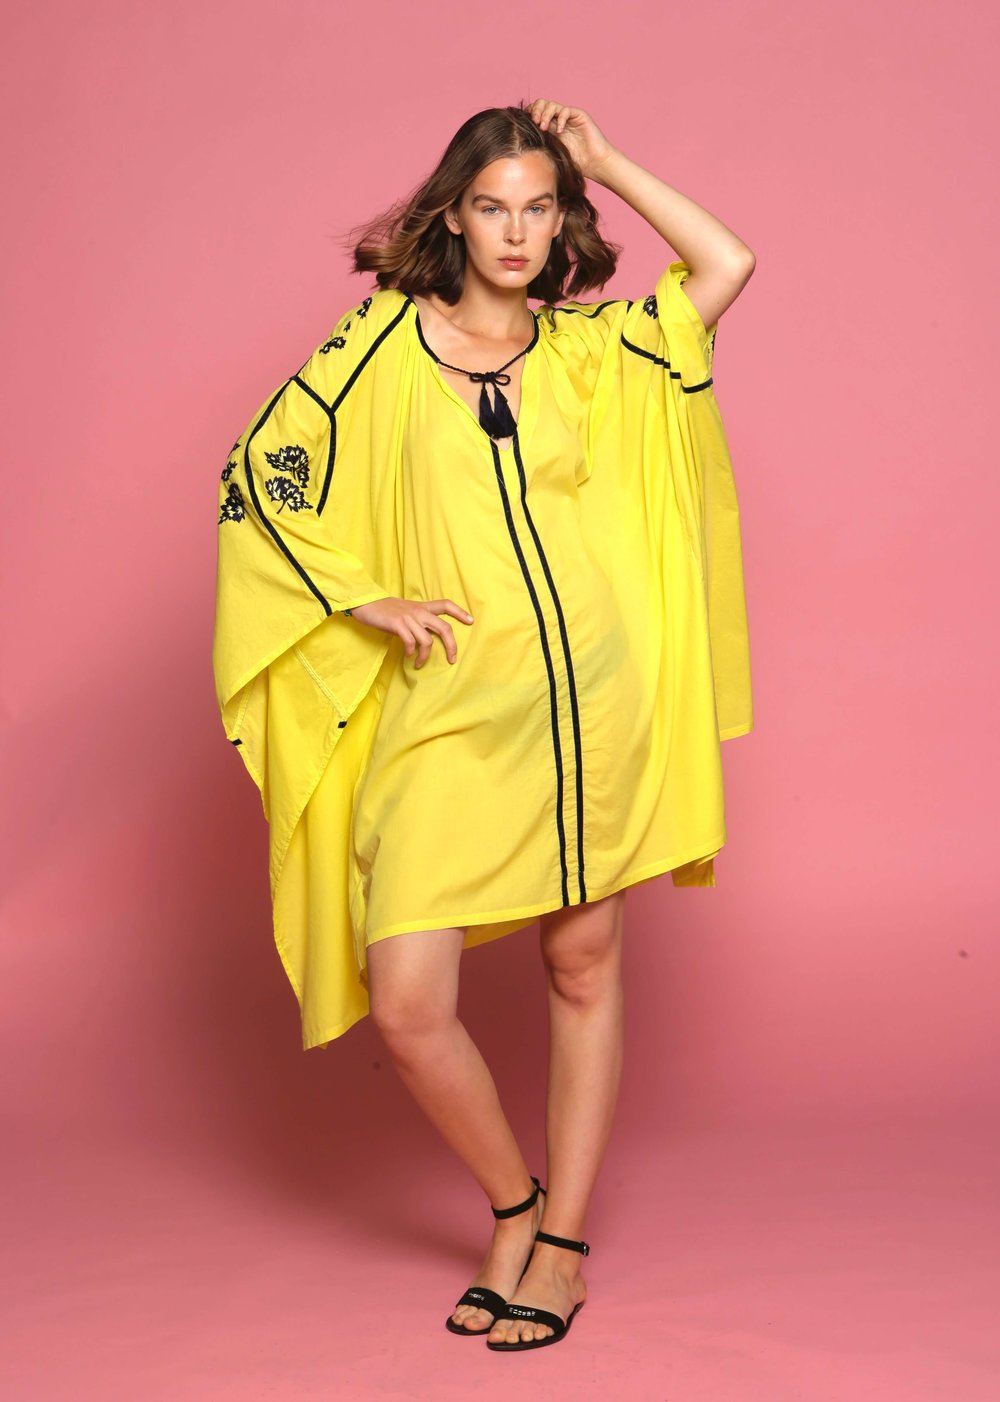 Coverup dress Elana.jpeg